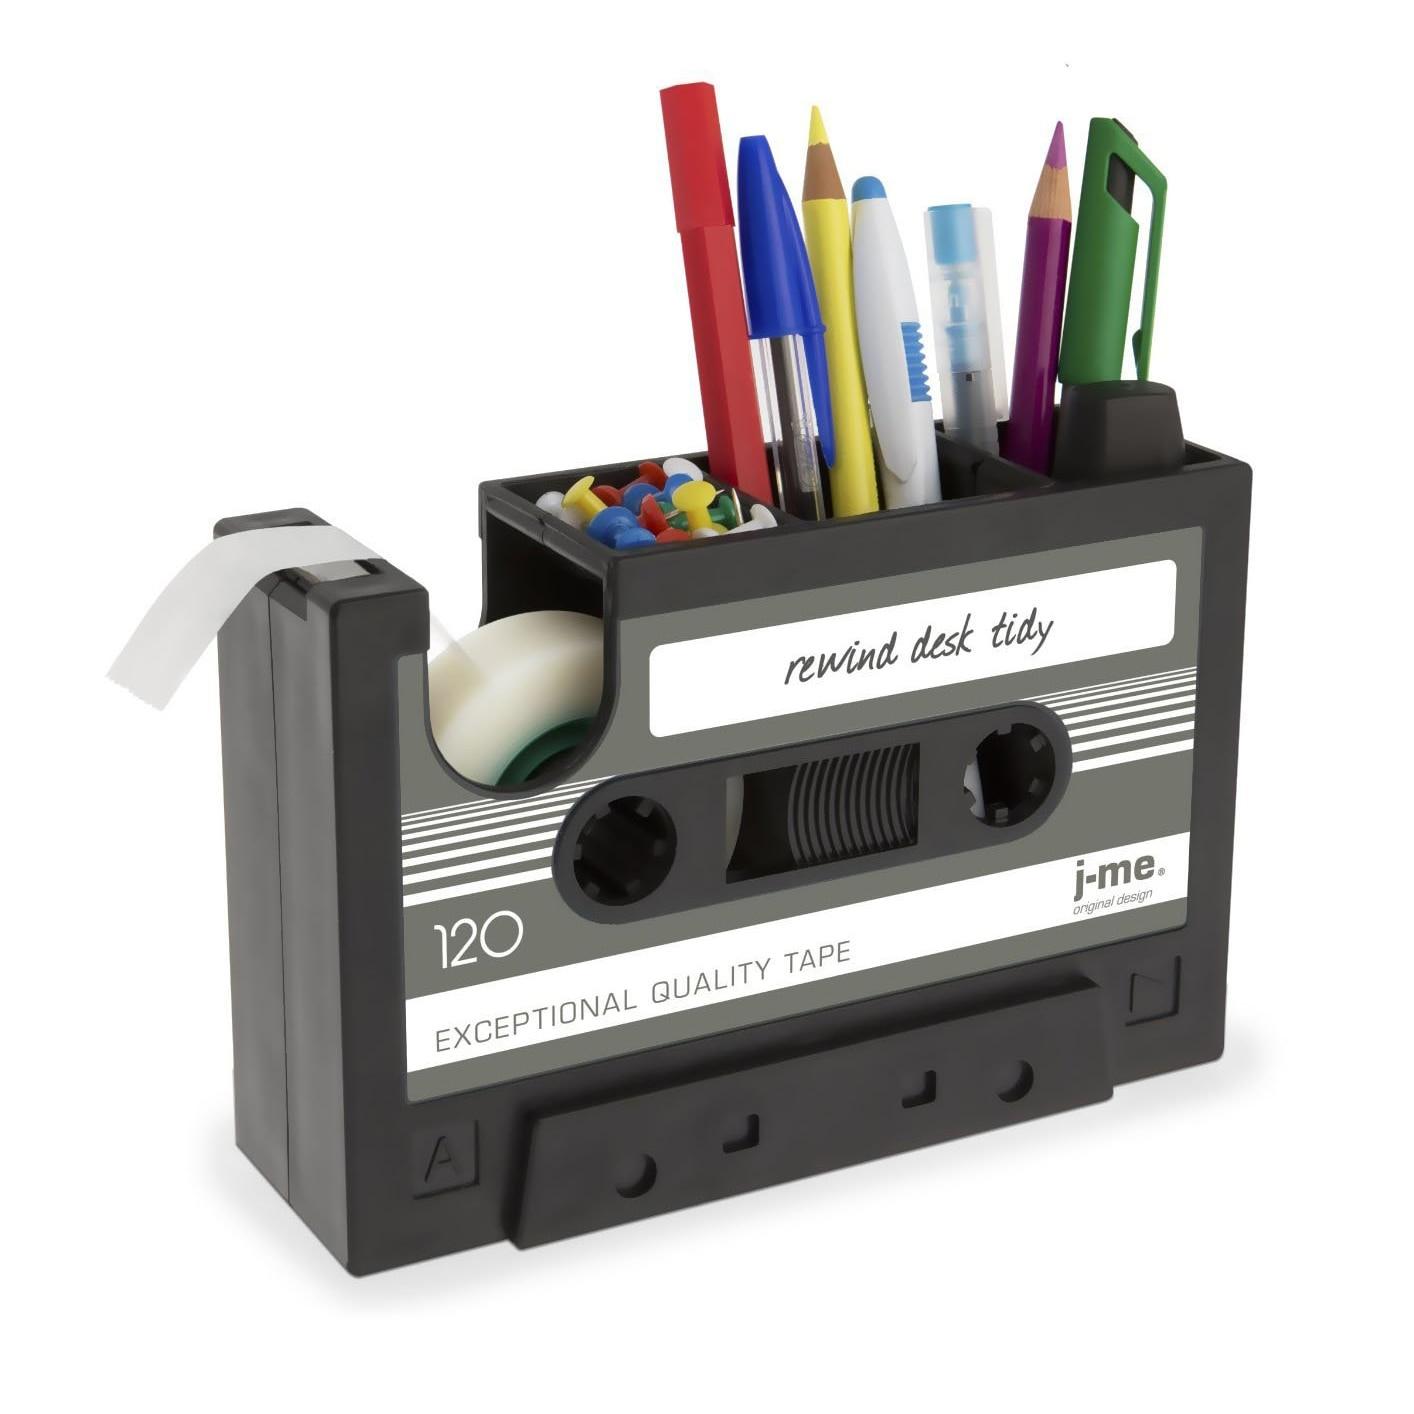 Cassette Tape Dispenser Pen Holder Vase Pencil Pot Stationery Desk Tidy Container Office Stationery Supplier Gift(black)